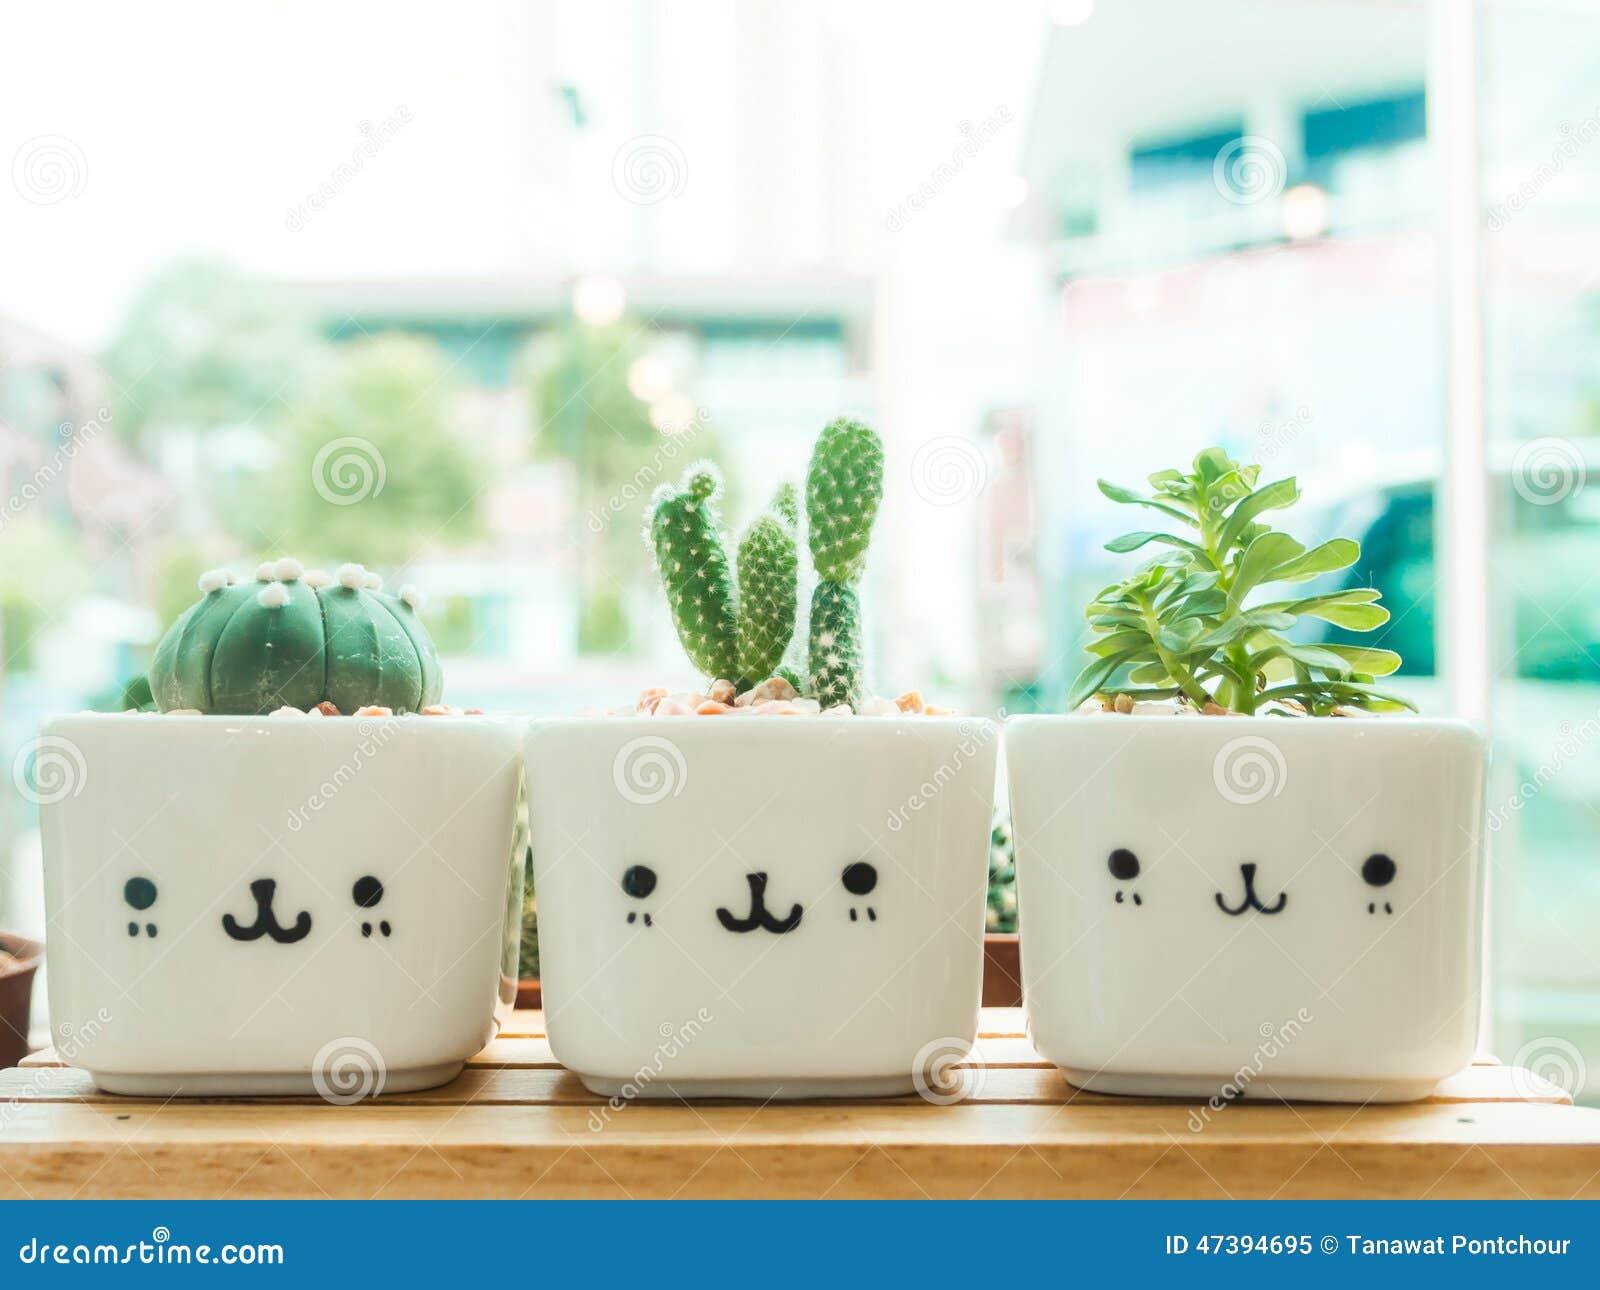 Modern window sill - Adorable Indoor Cactus Garden Stock Photo Image 47394695